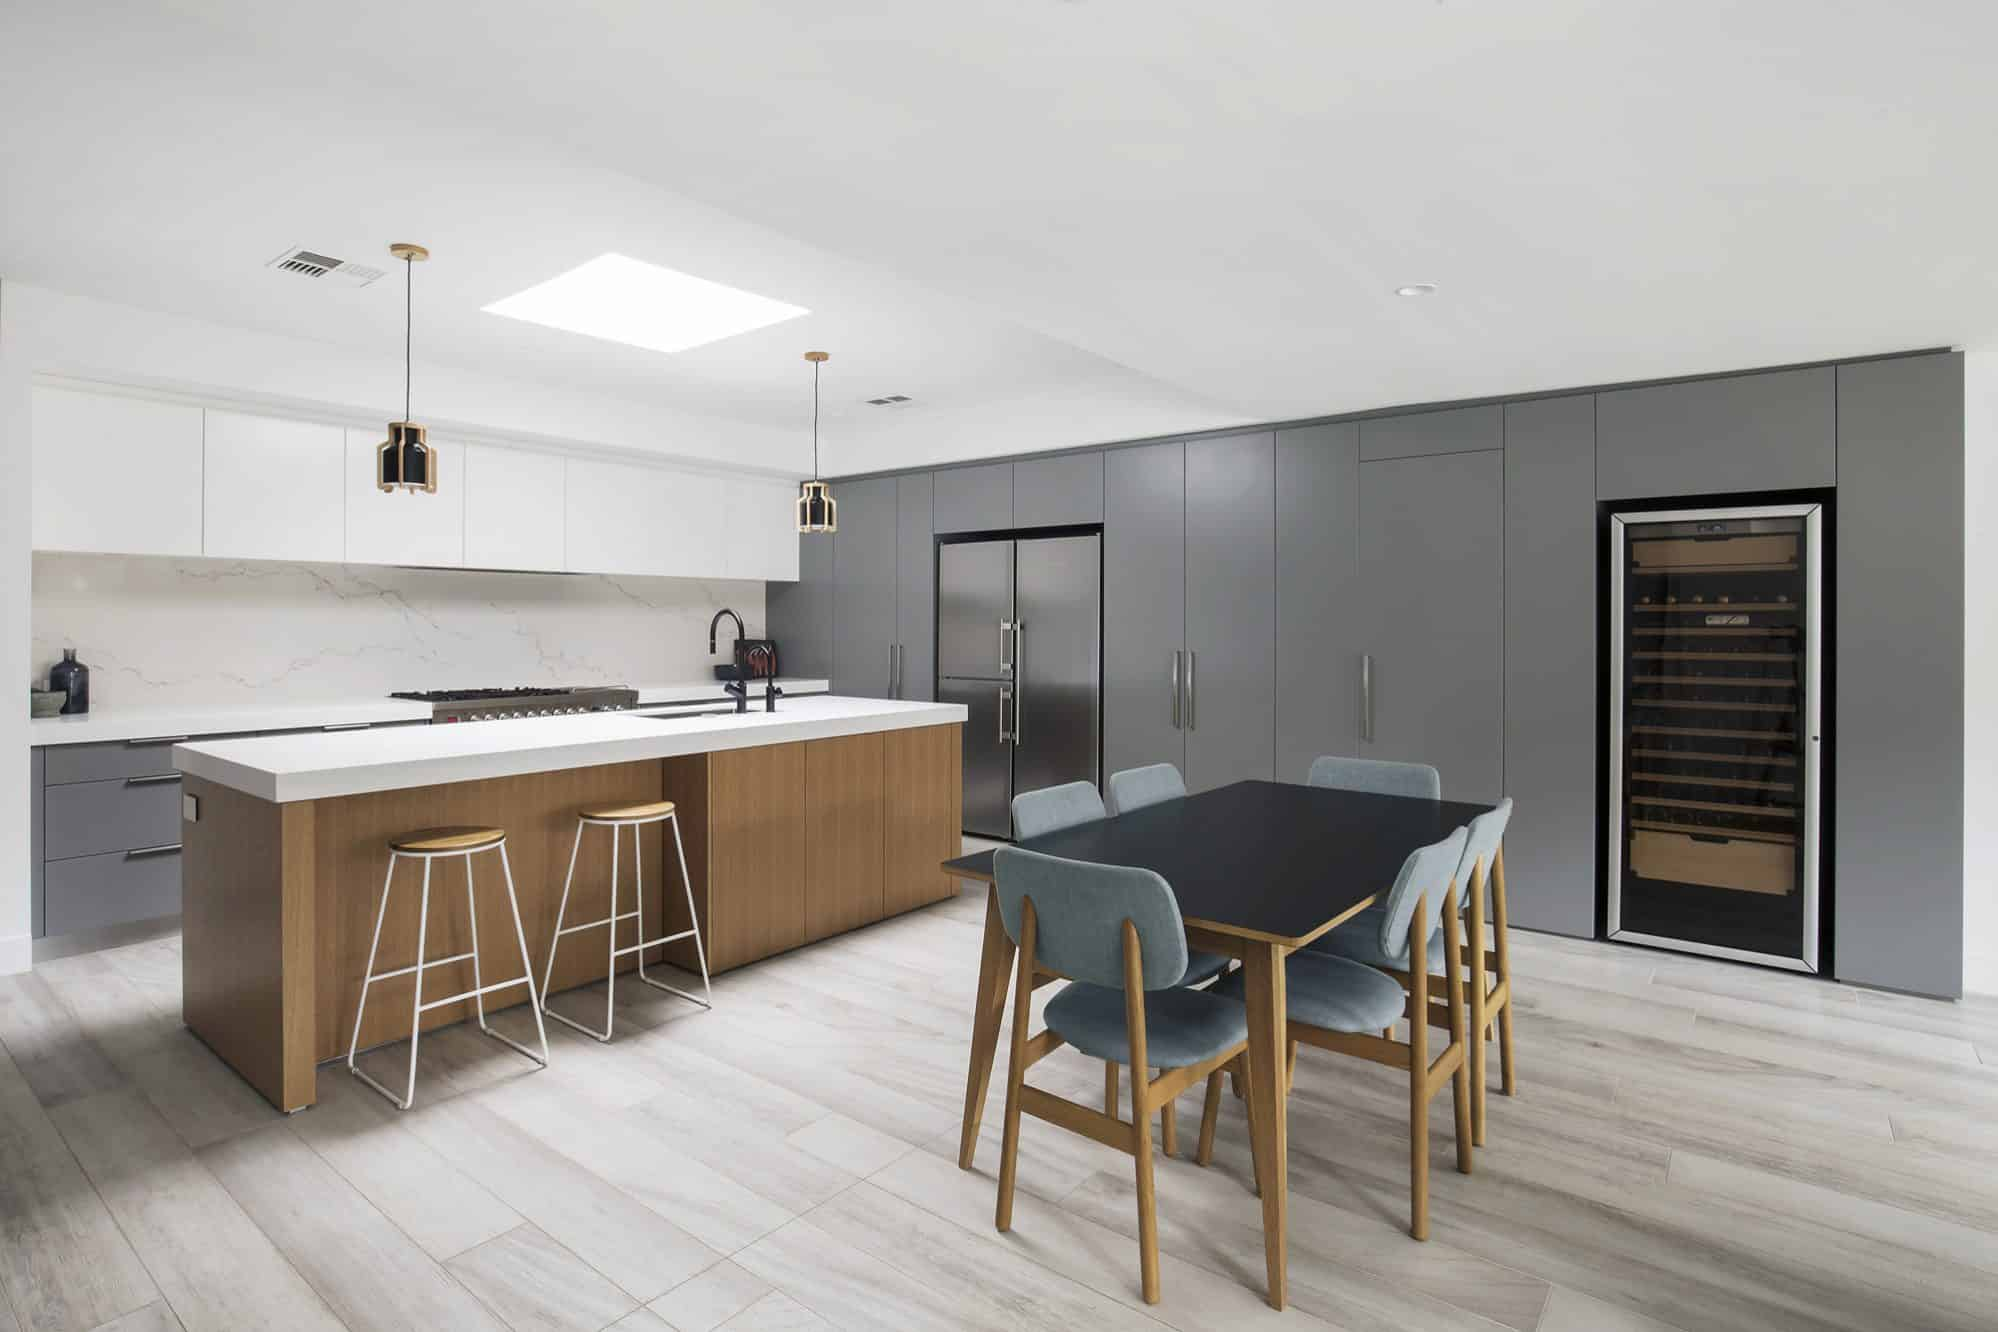 Randwick Kitchen overall